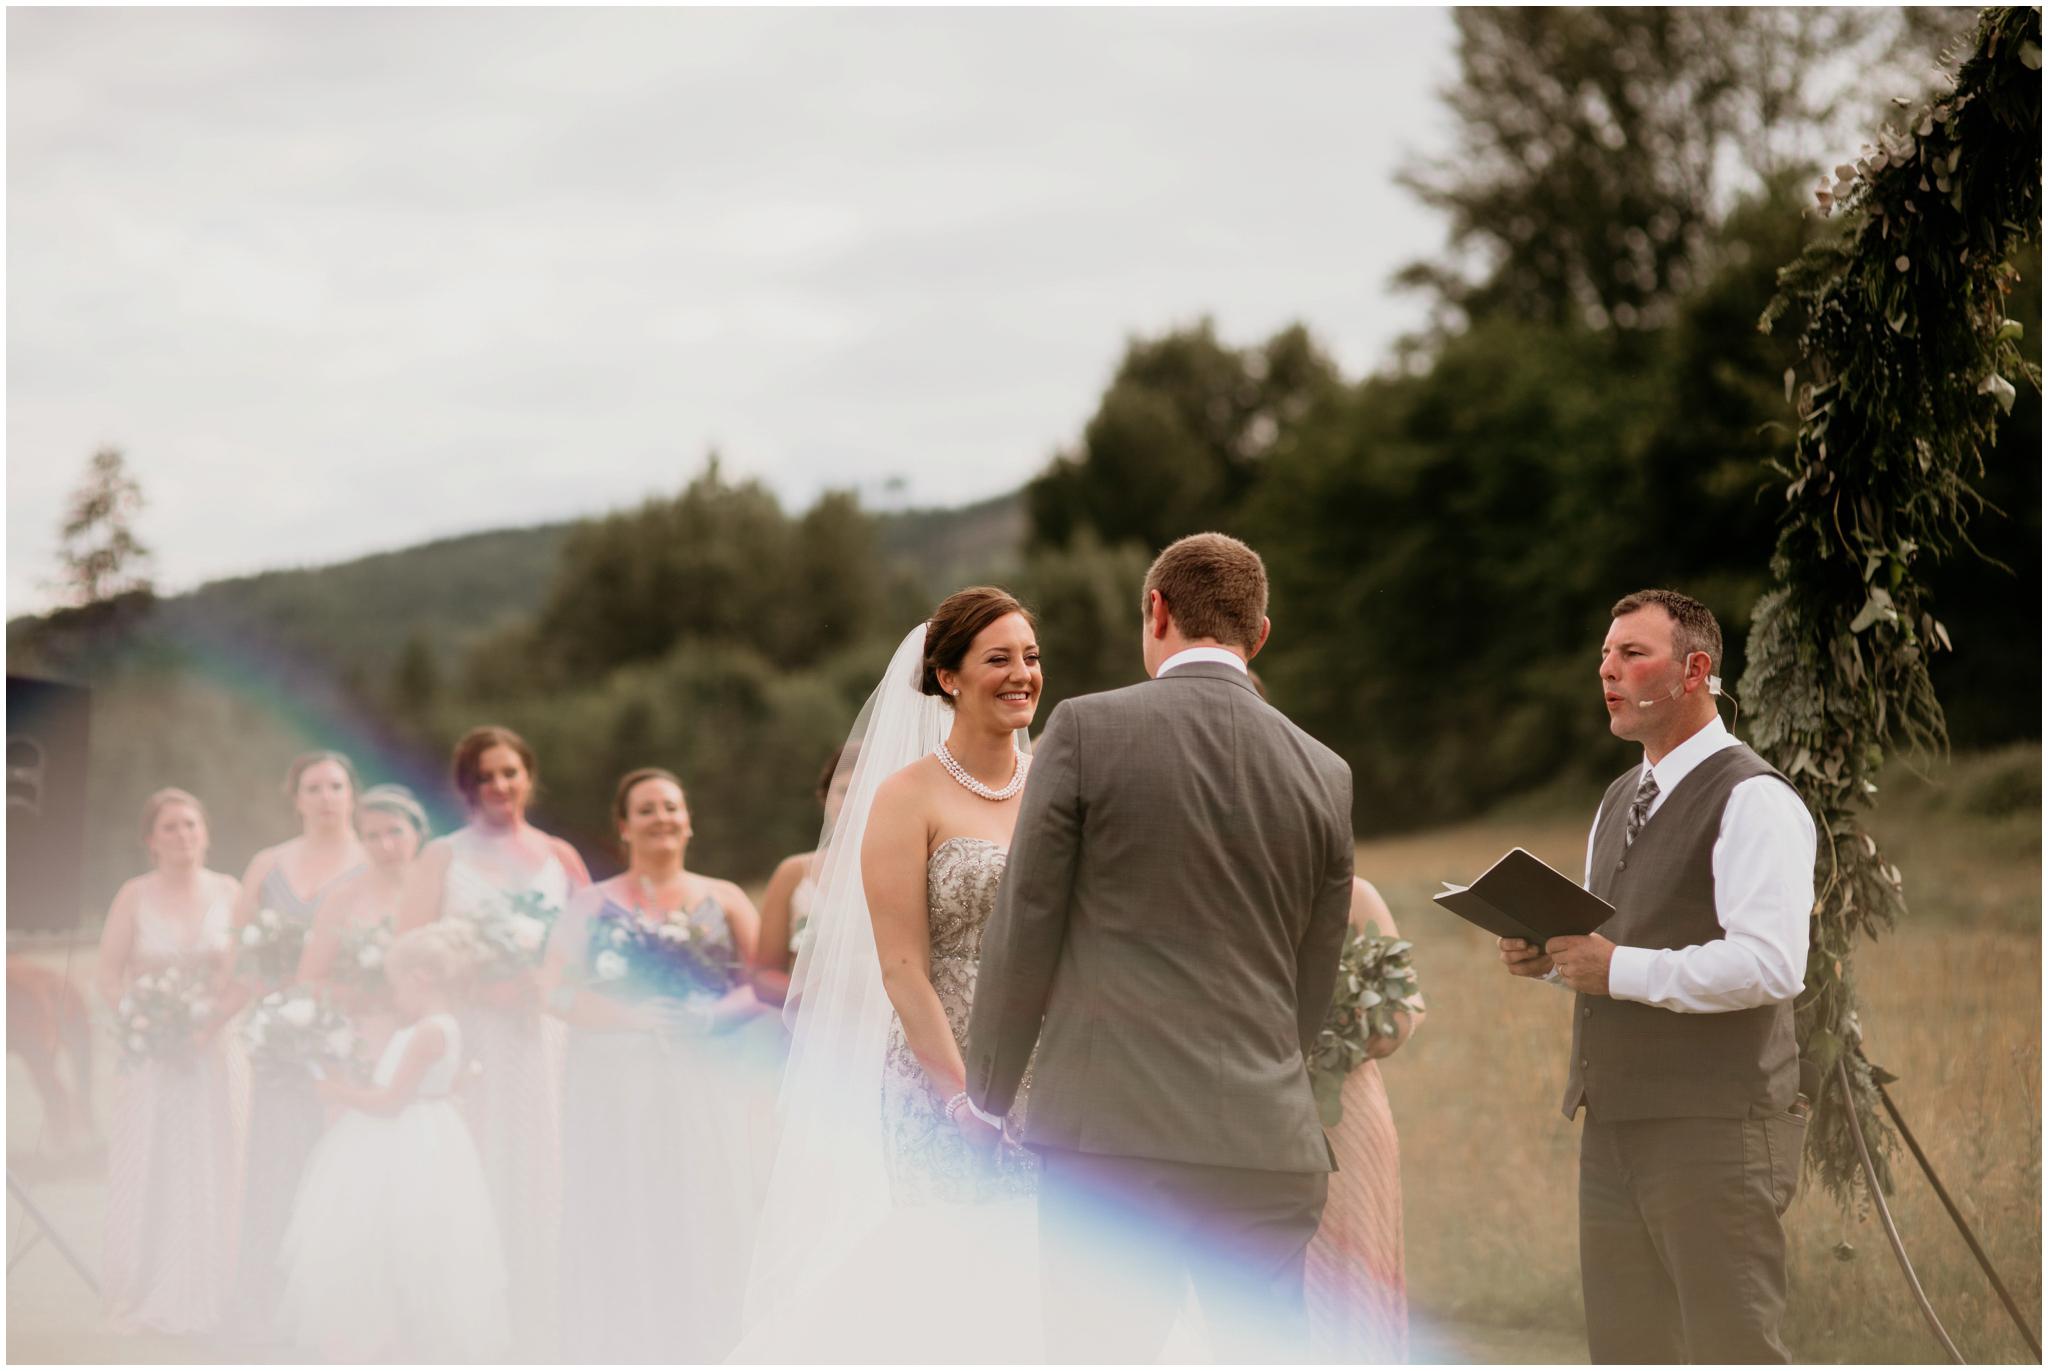 alex-and-matthew-three-cs-farm-venue-seattle-wedding-photographer-109.jpg